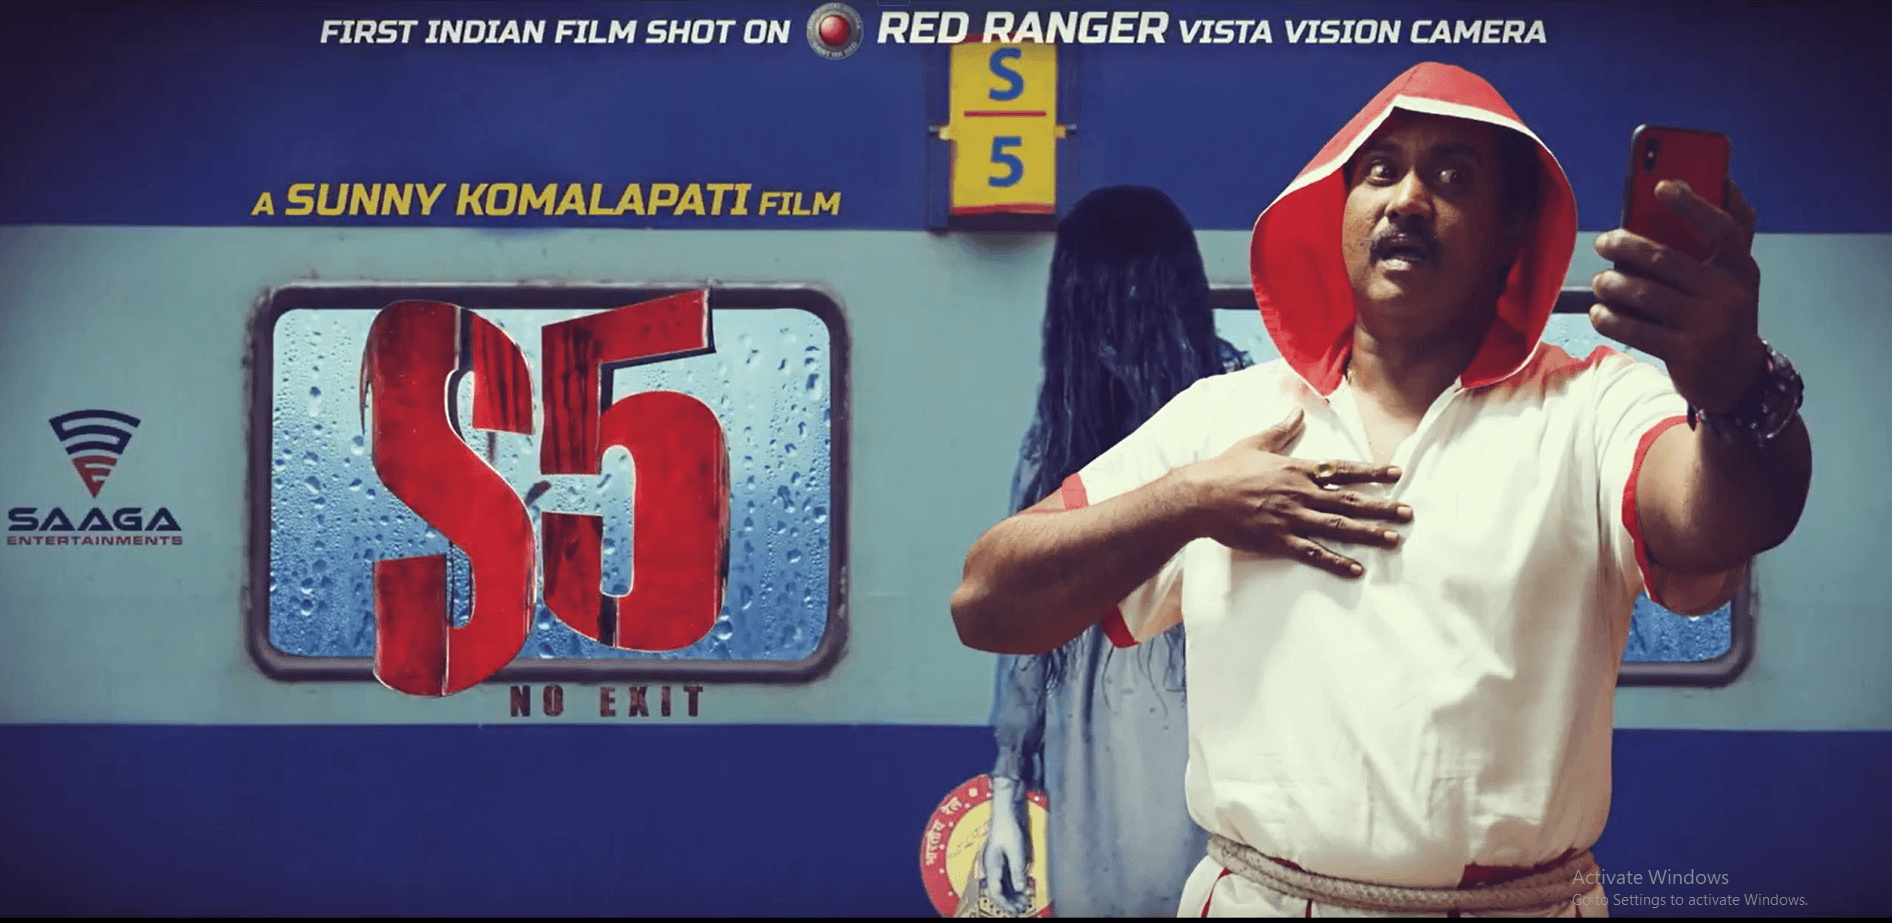 S5 No Exit Telugu Movie